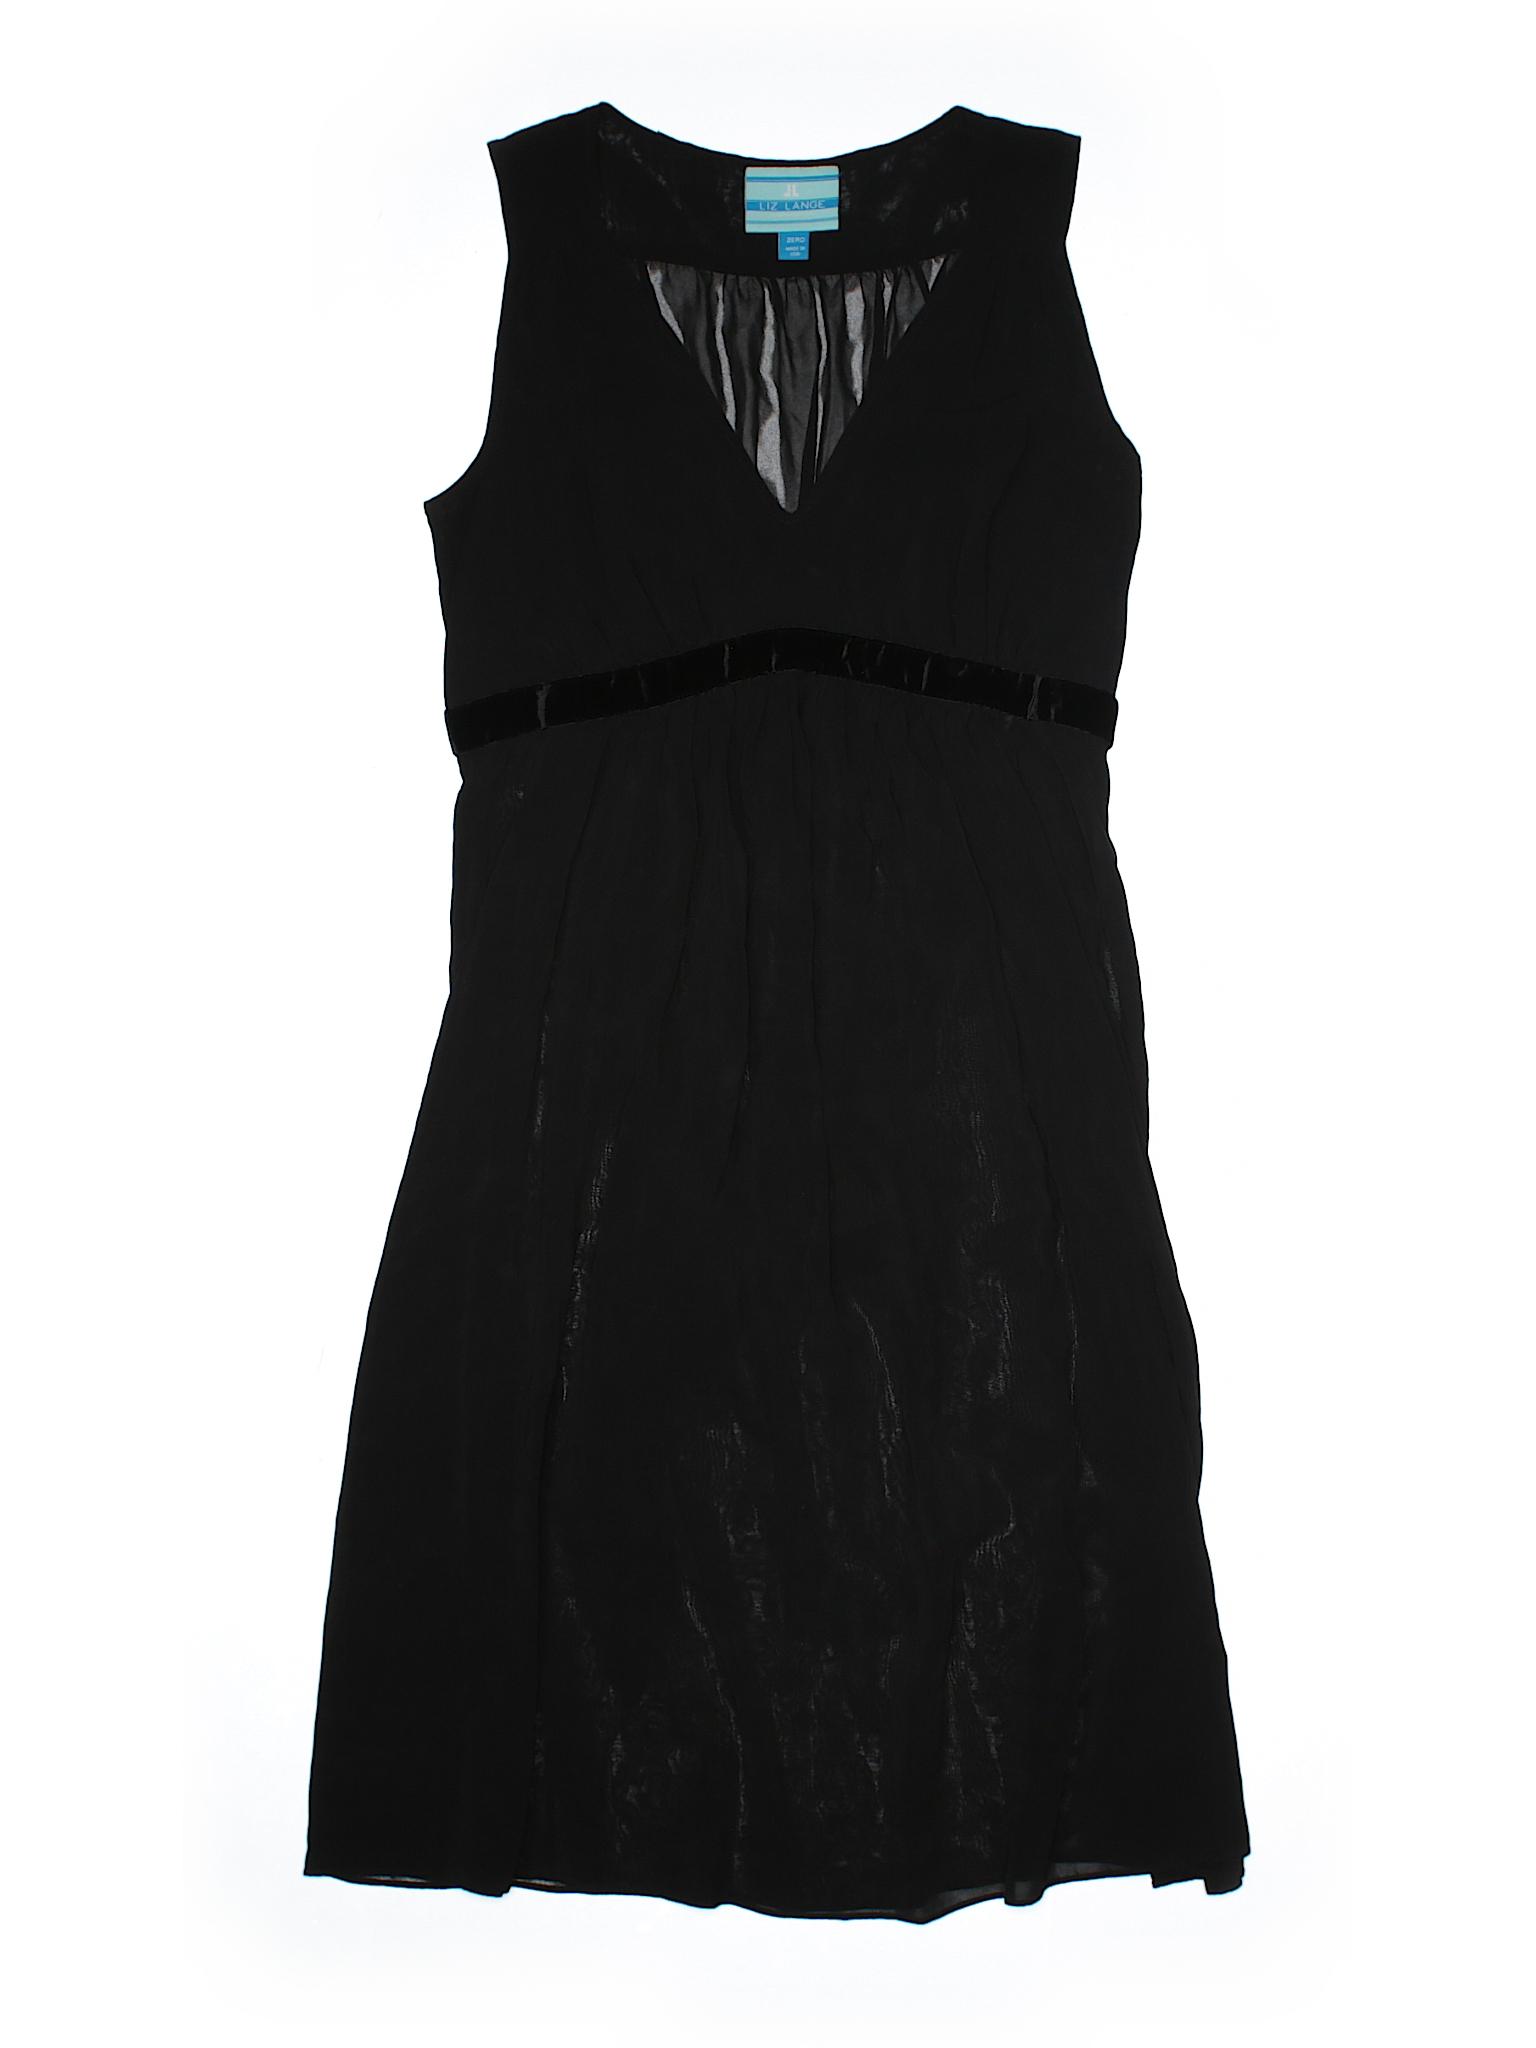 Lange Dress Boutique Casual winter Liz qn7xSpF